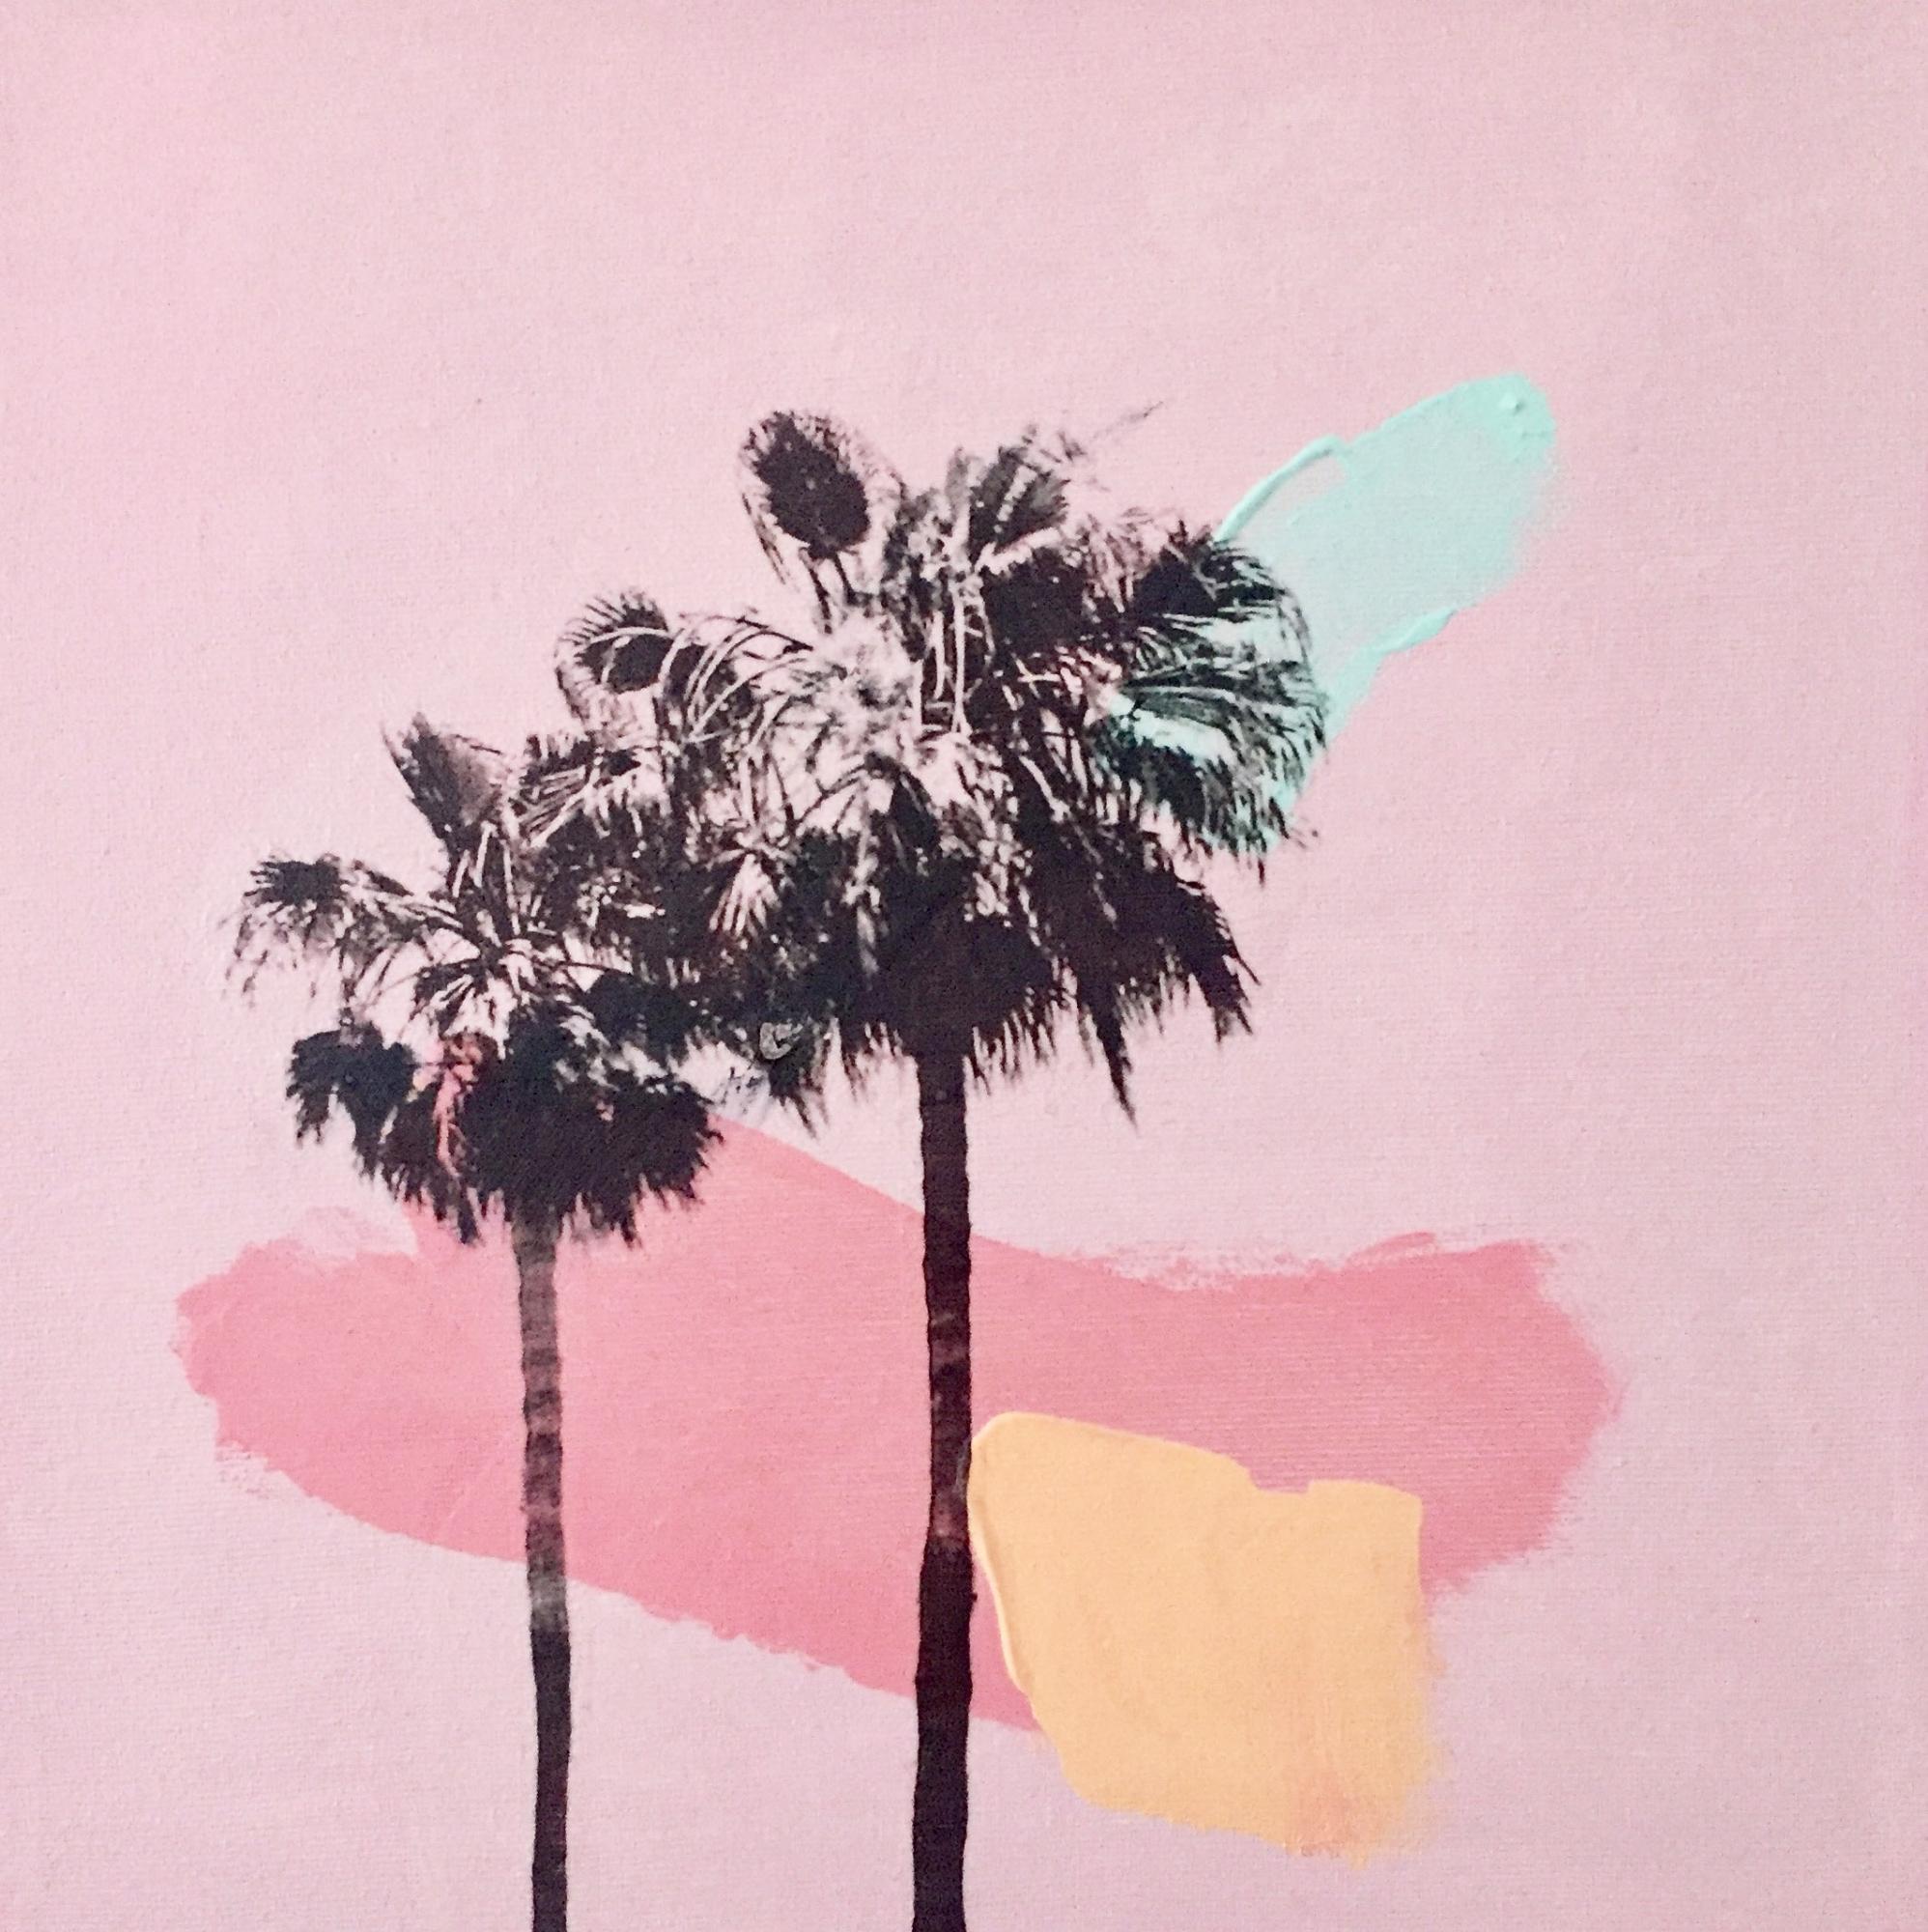 Sweet Breeze by Danielle Hession